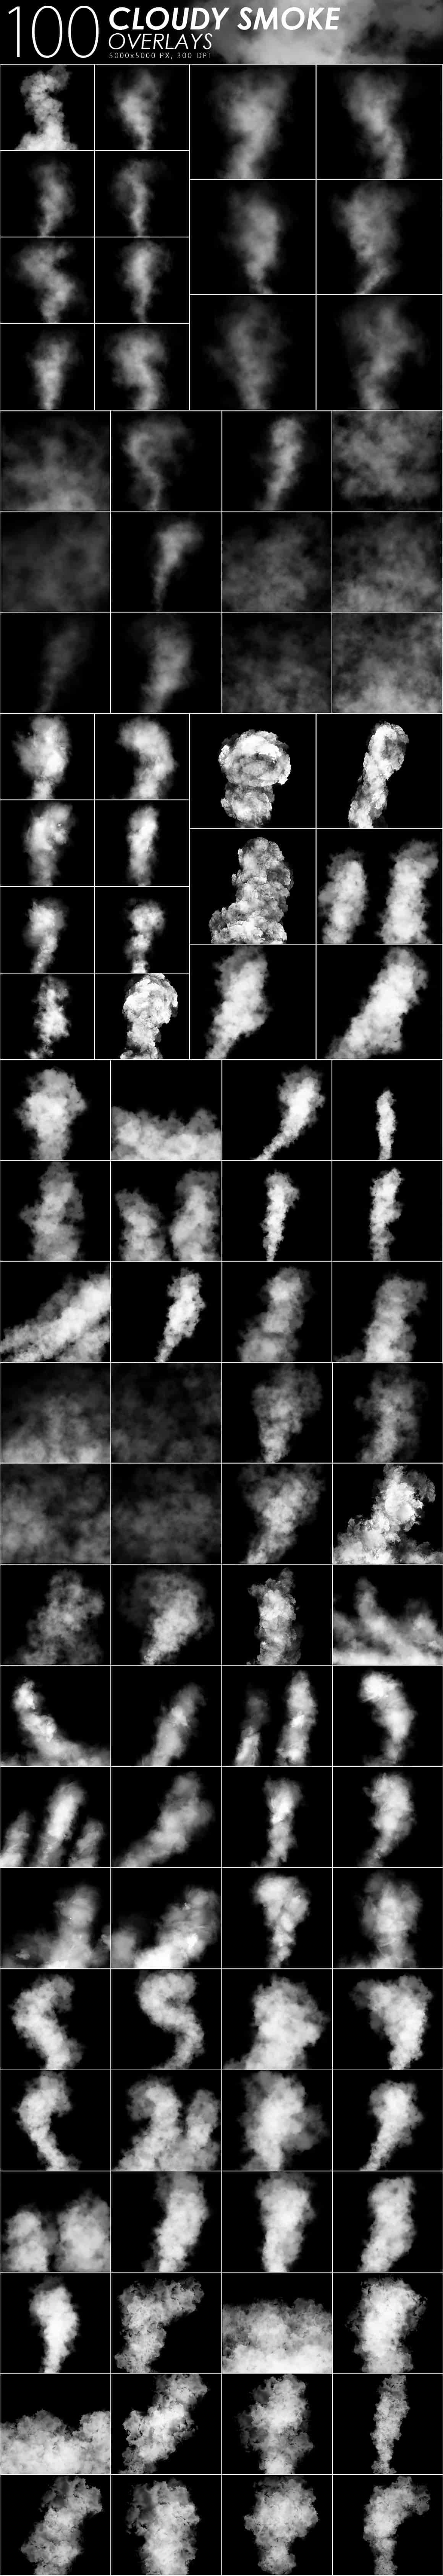 575 Fire, Smoke, Fog Overlays - just $15 - Cloudy Smoke prev min